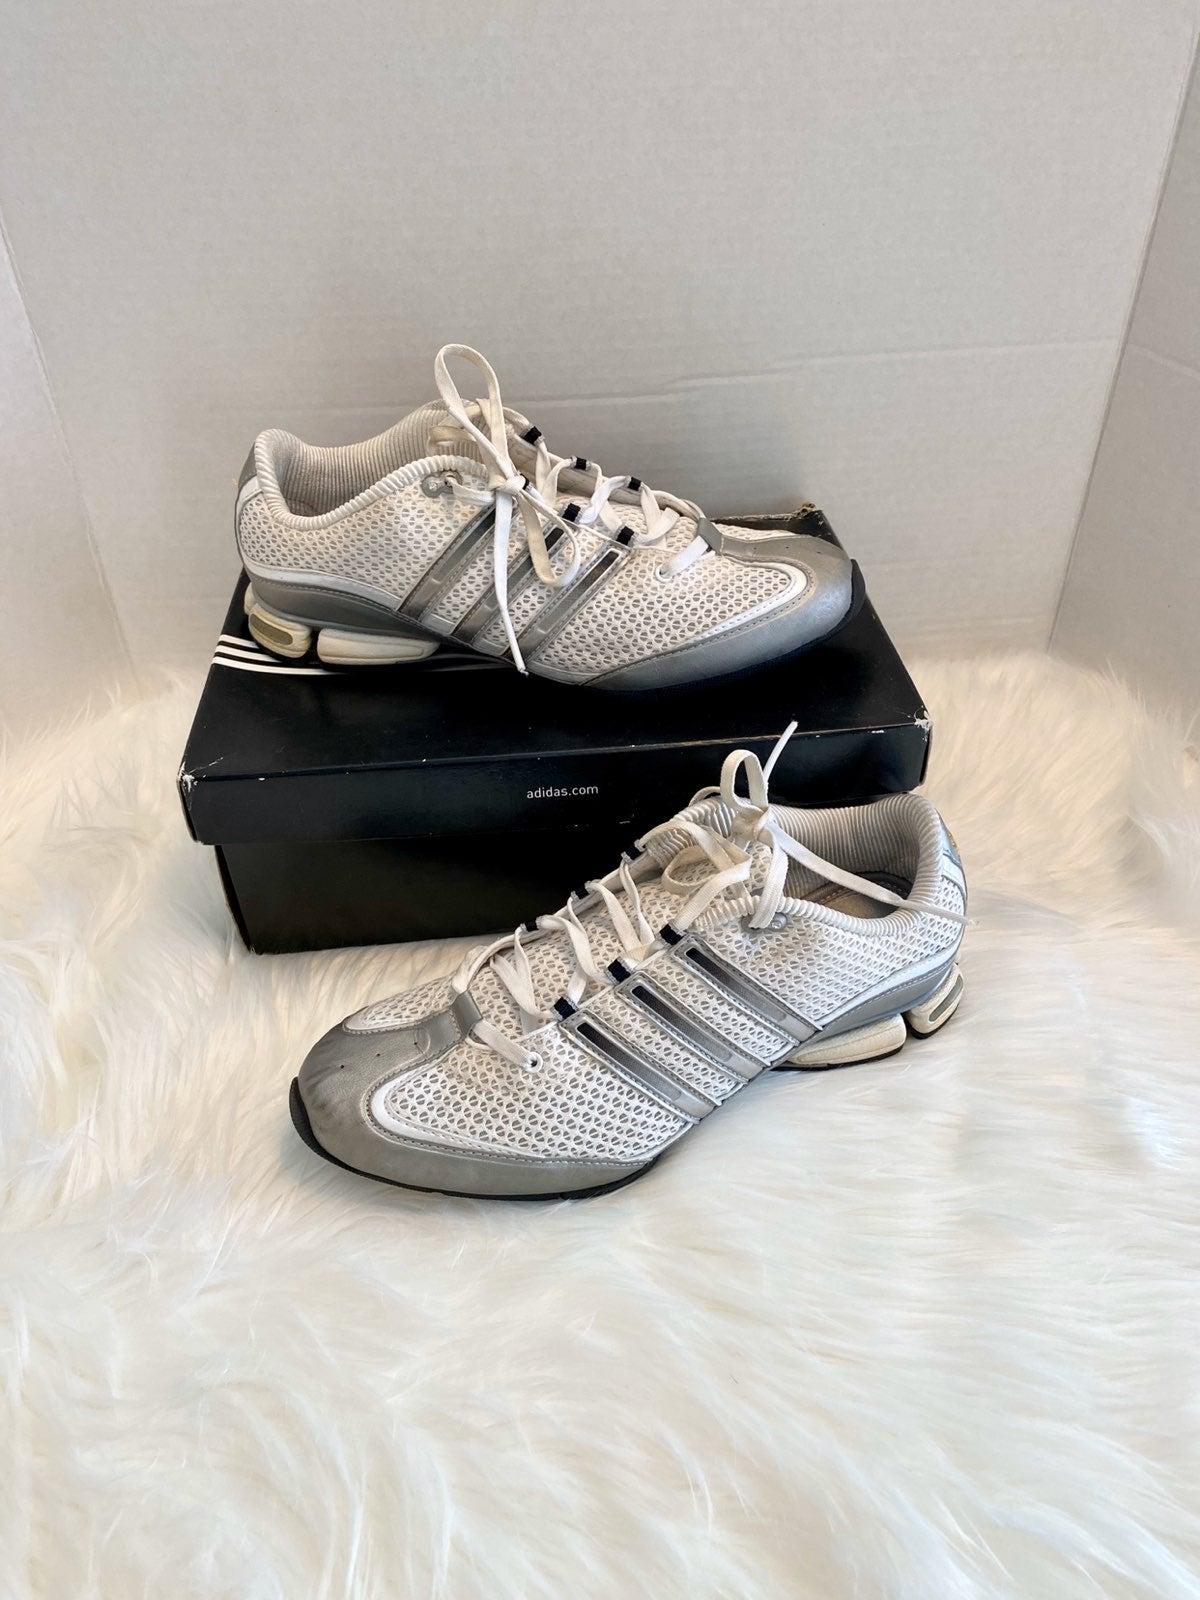 ADIDAS Jhana White Silver Black Sneakers